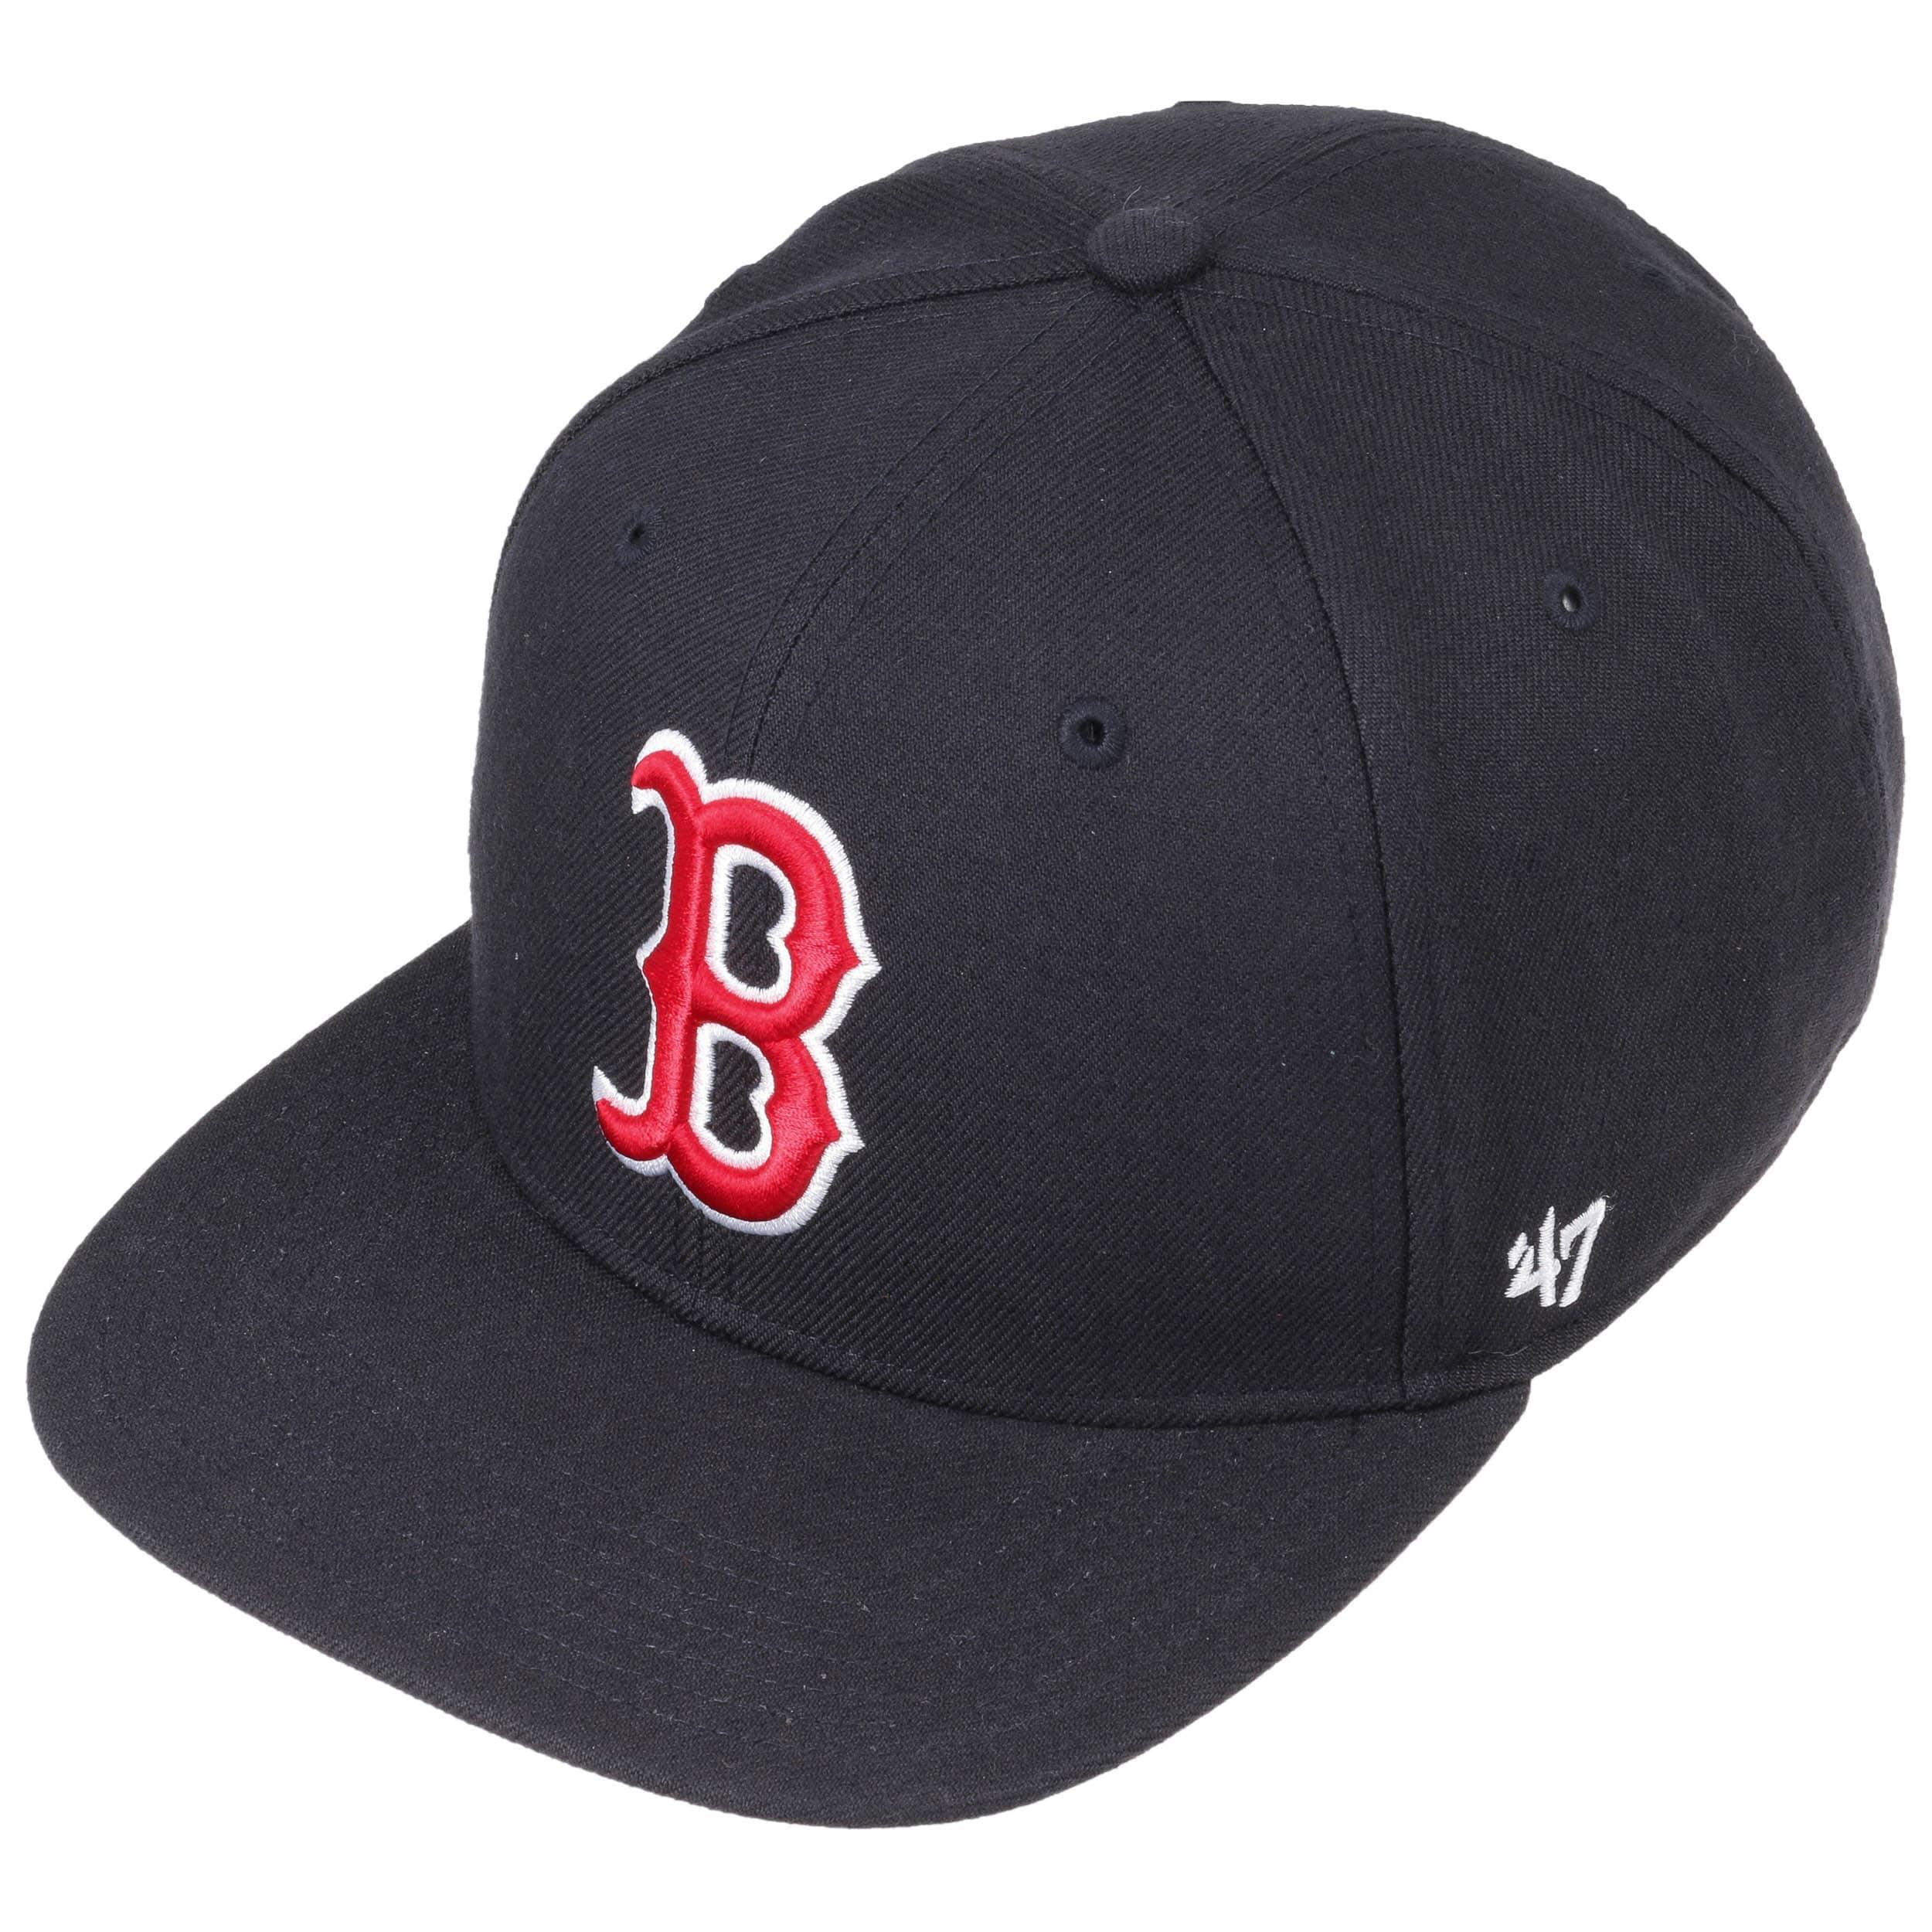 74f895c11b2 NoShot Red Sox Snapback Cap by 47 Brand - navy 1 ...